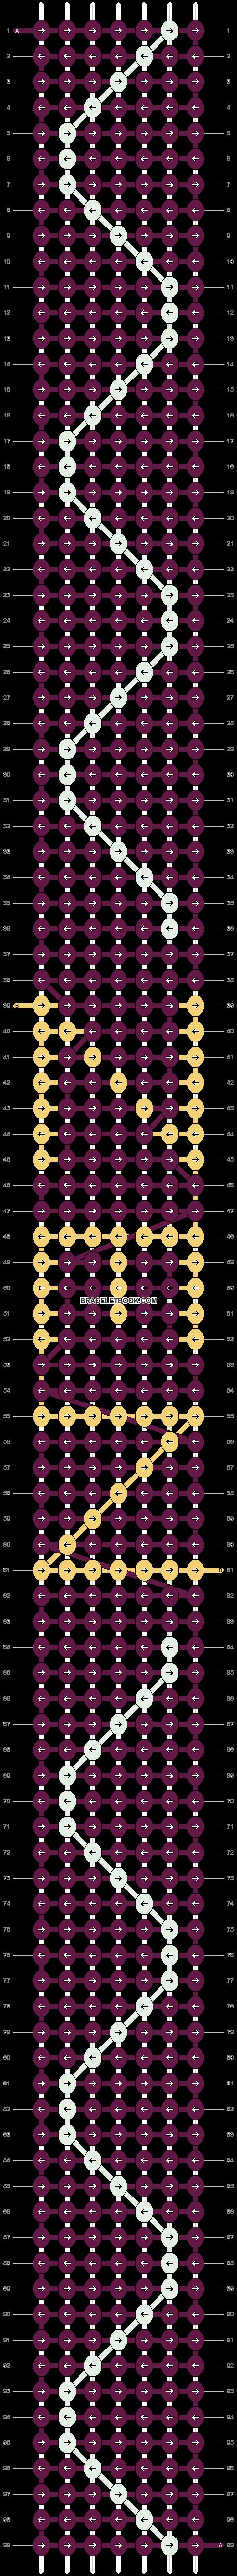 Alpha pattern #18280 pattern